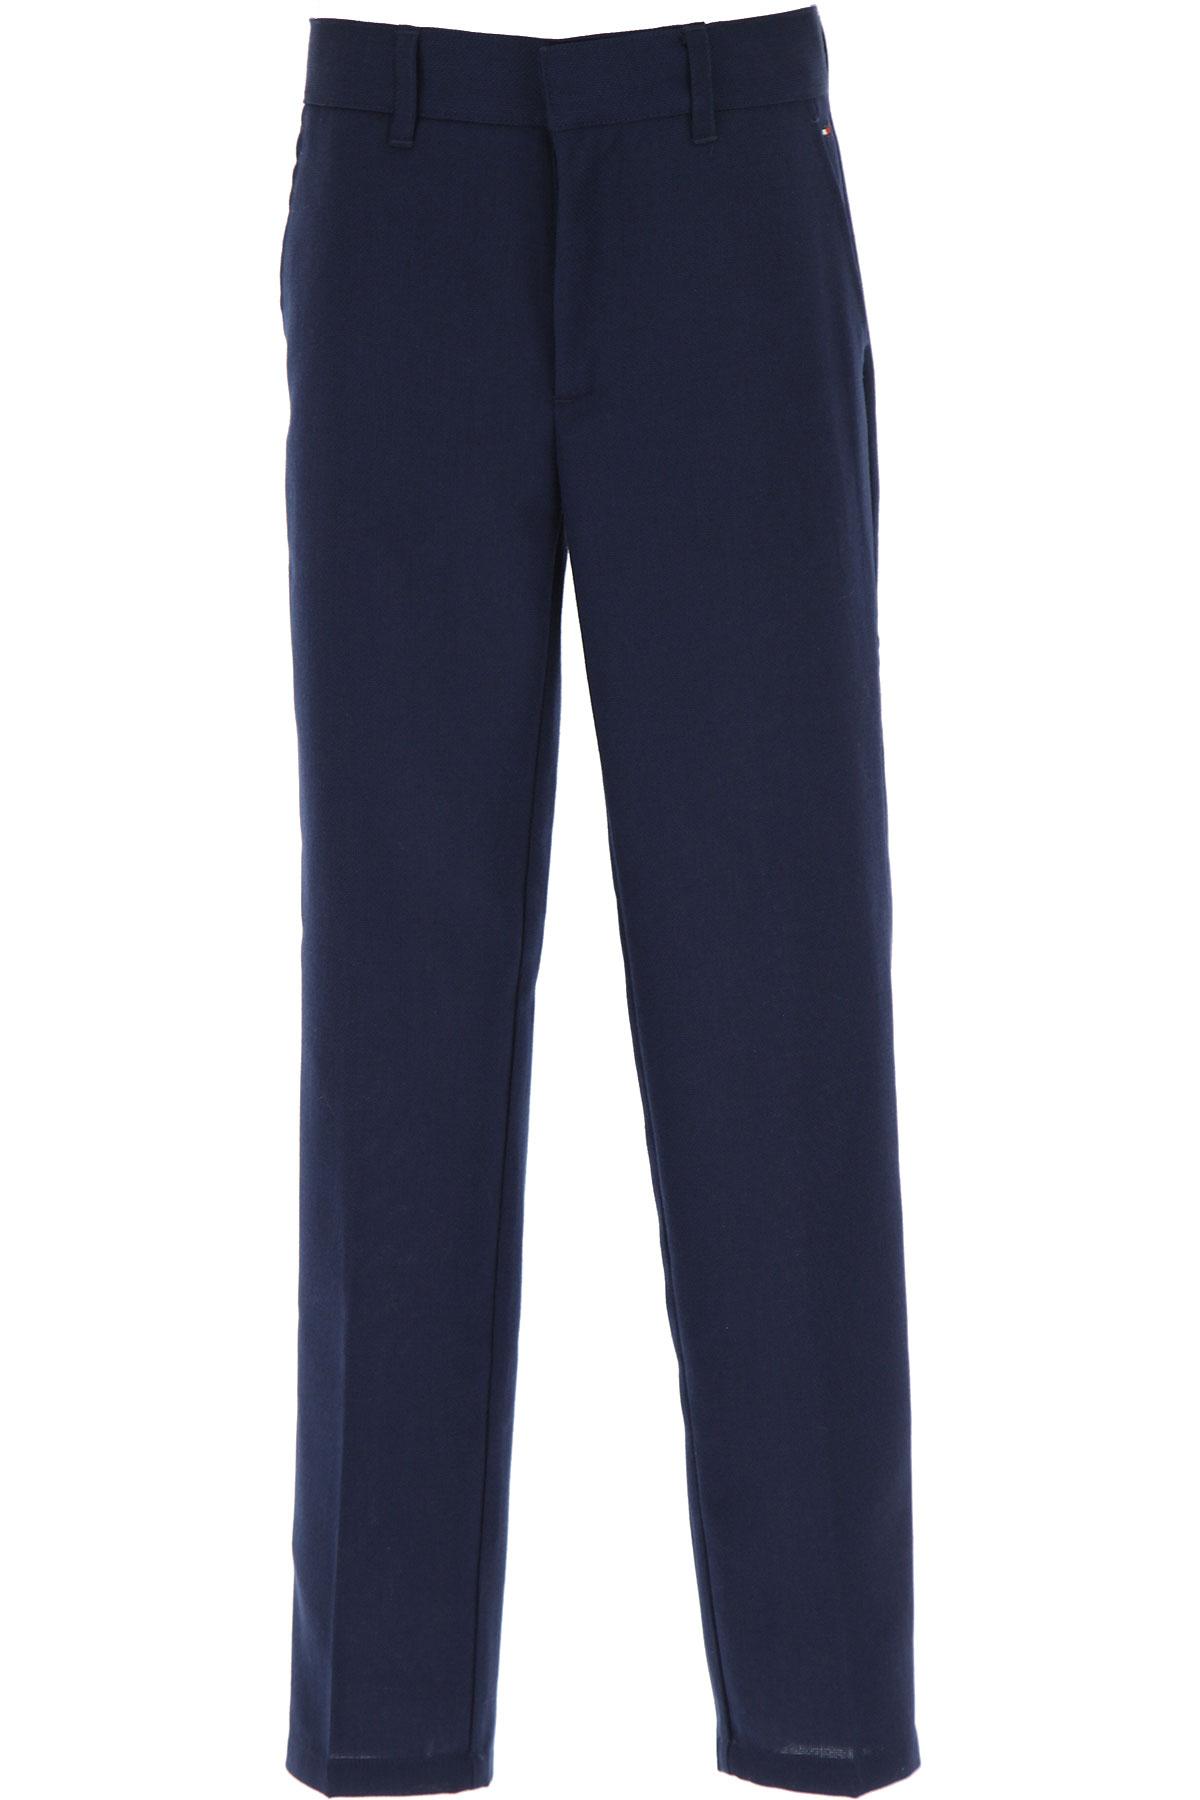 Tommy Hilfiger Kids Pants for Boys On Sale, Blue, polyester, 2019, 10Y 12Y 8Y